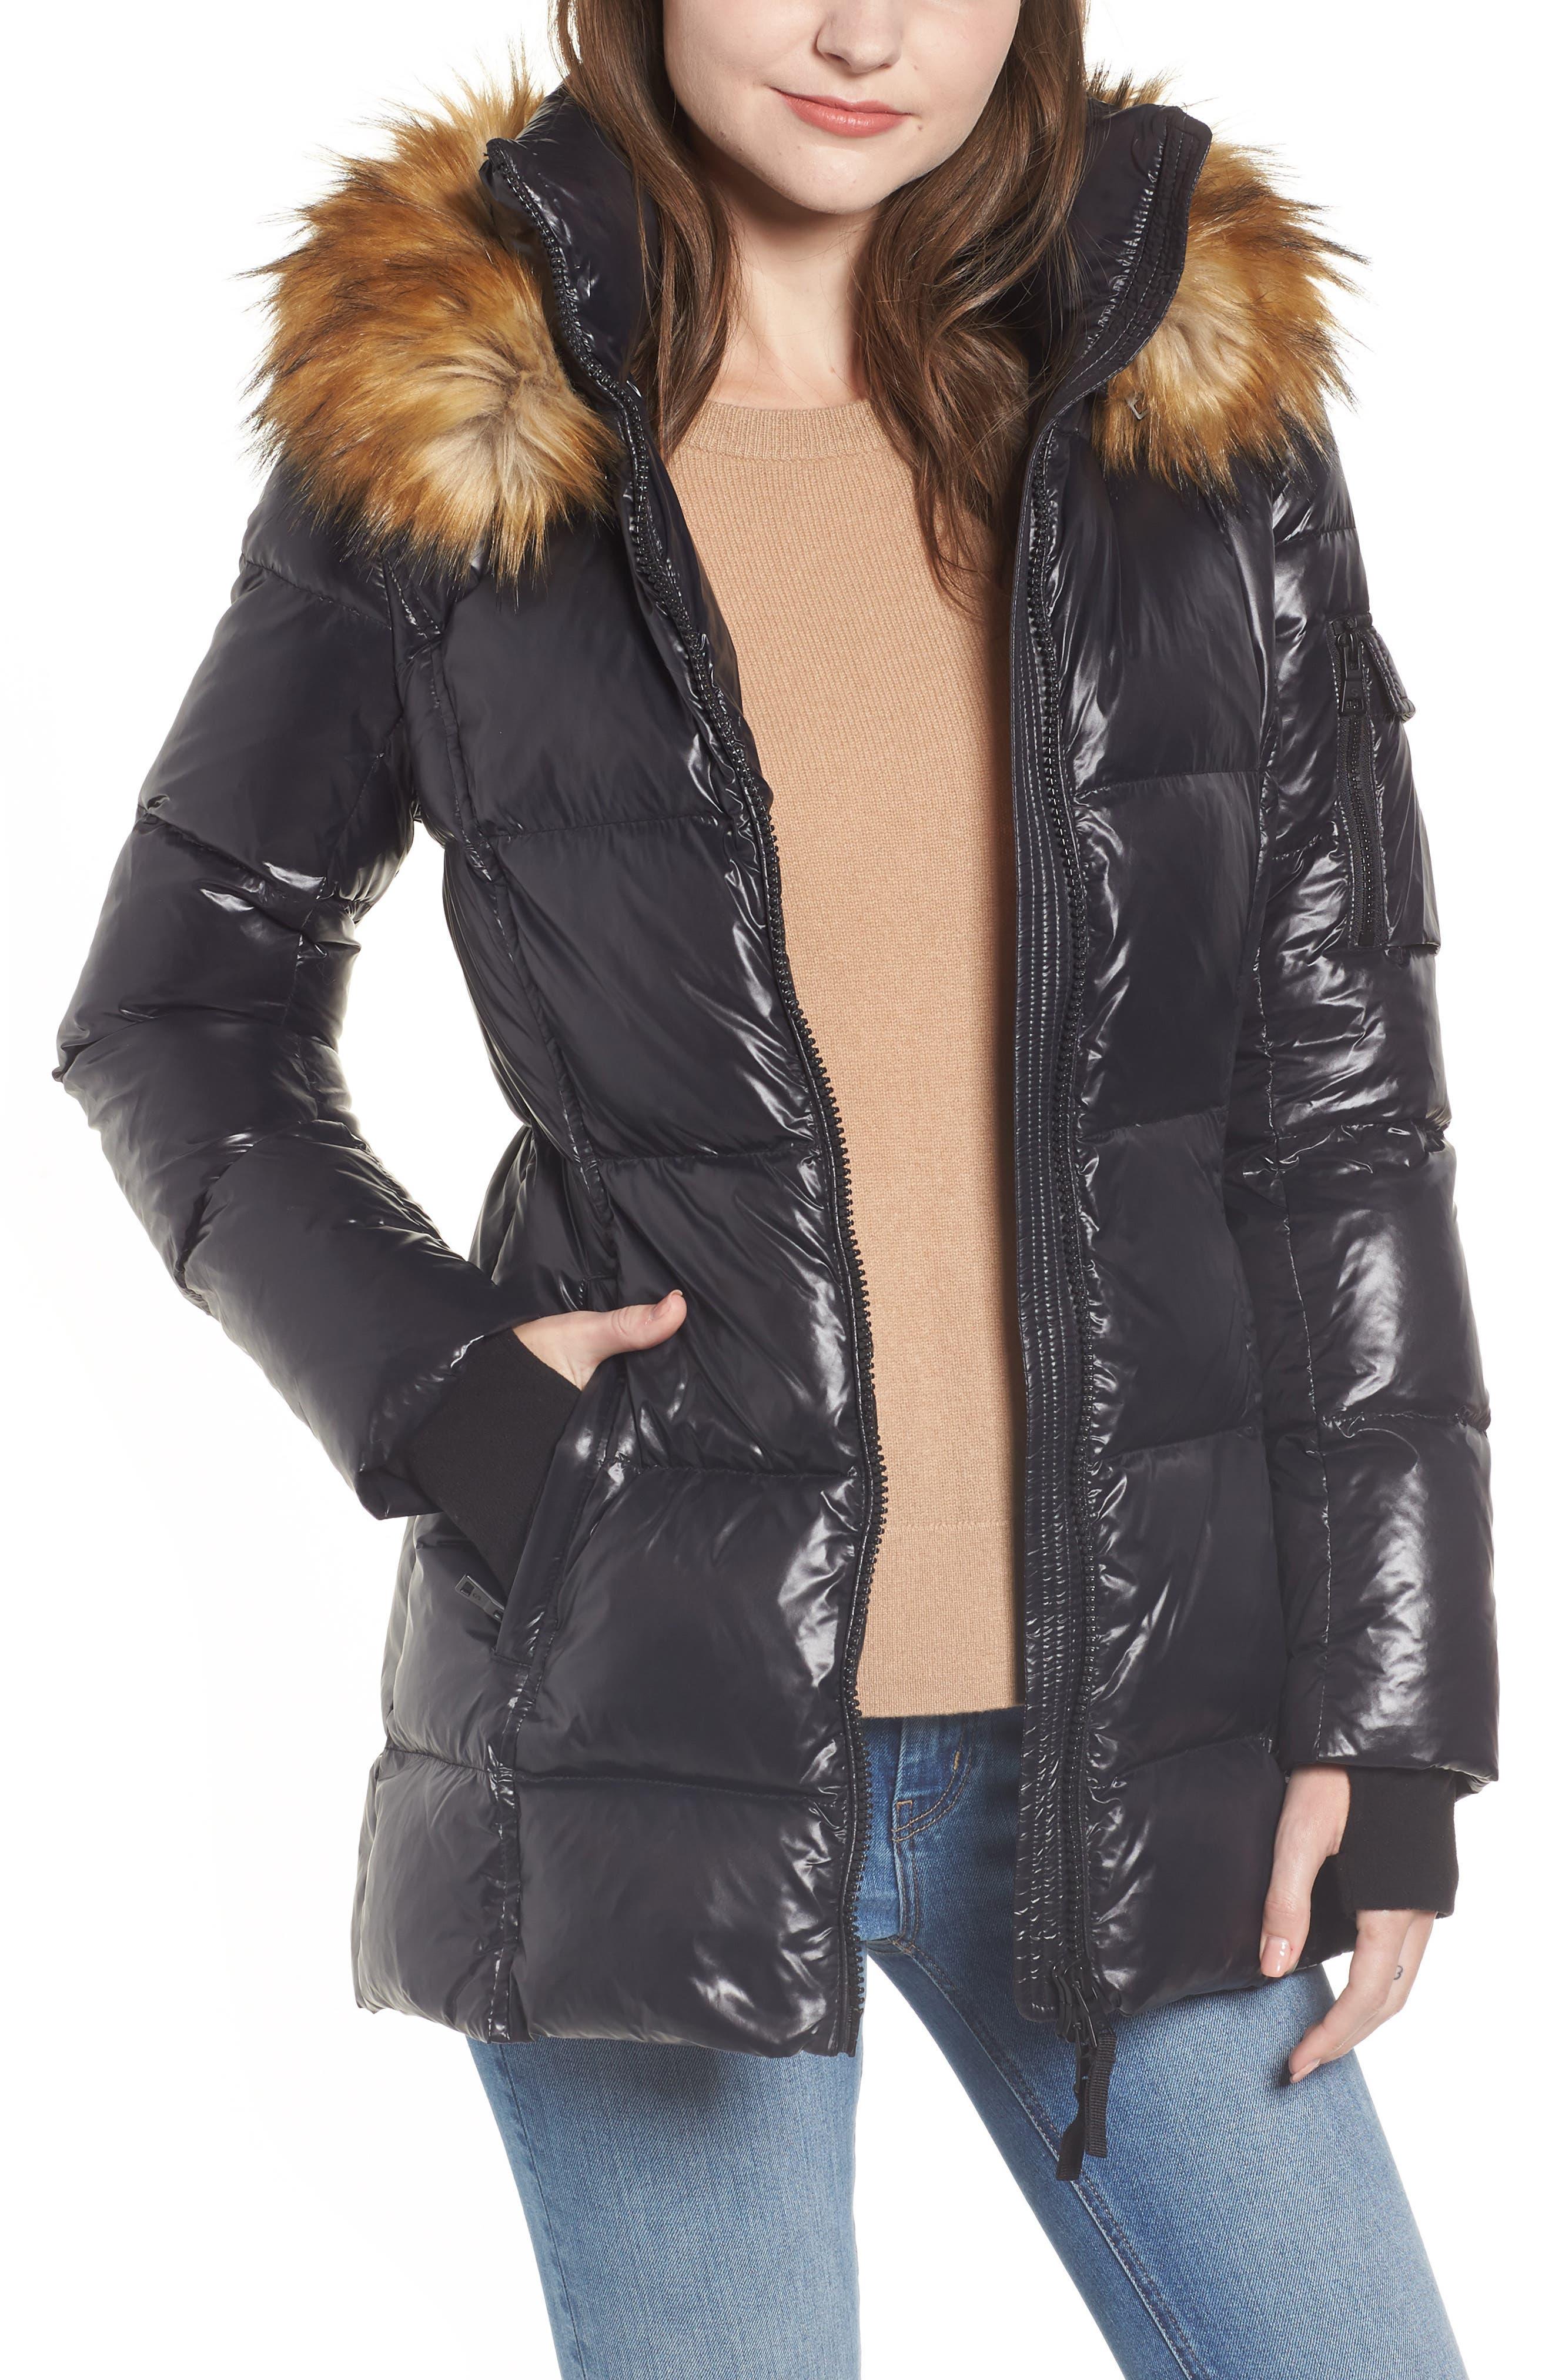 S13 Gramercy Faux Fur Trim Down Puffer Jacket